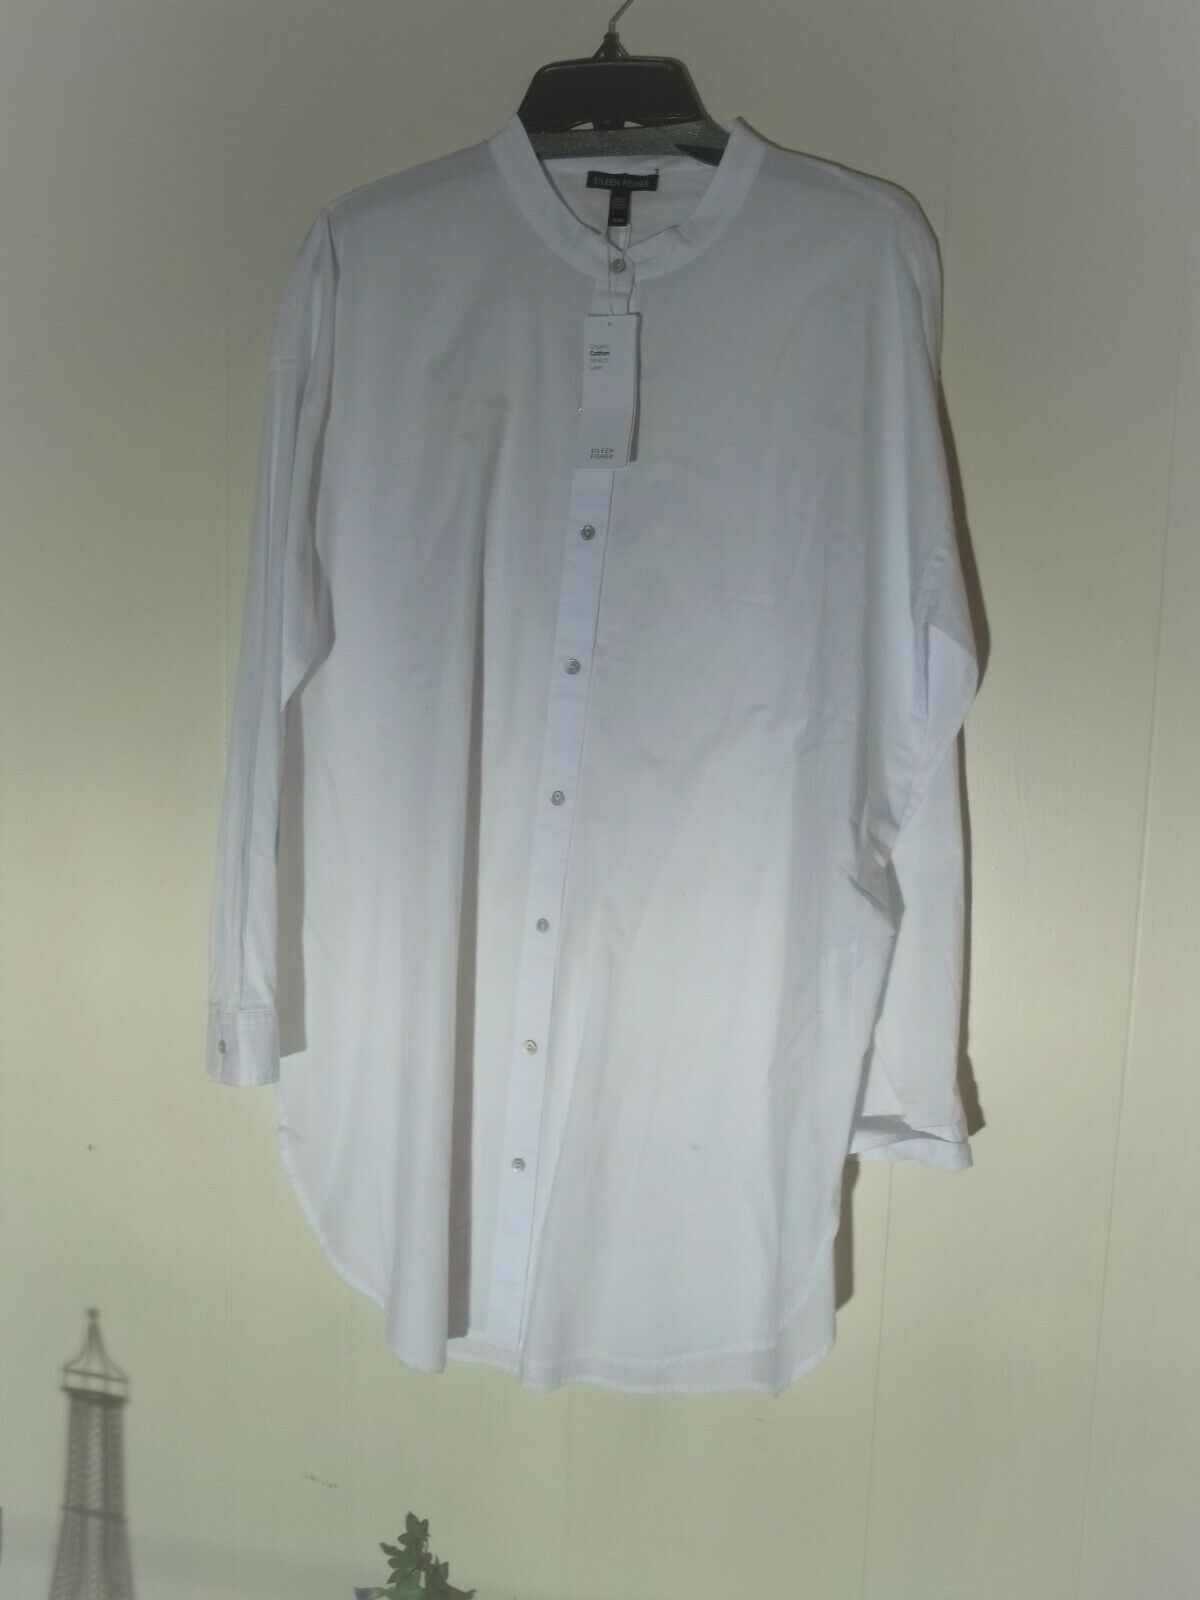 Sz M Eileen Fisher Weiß organic cotton stretch lawn top shirt NEW NWT